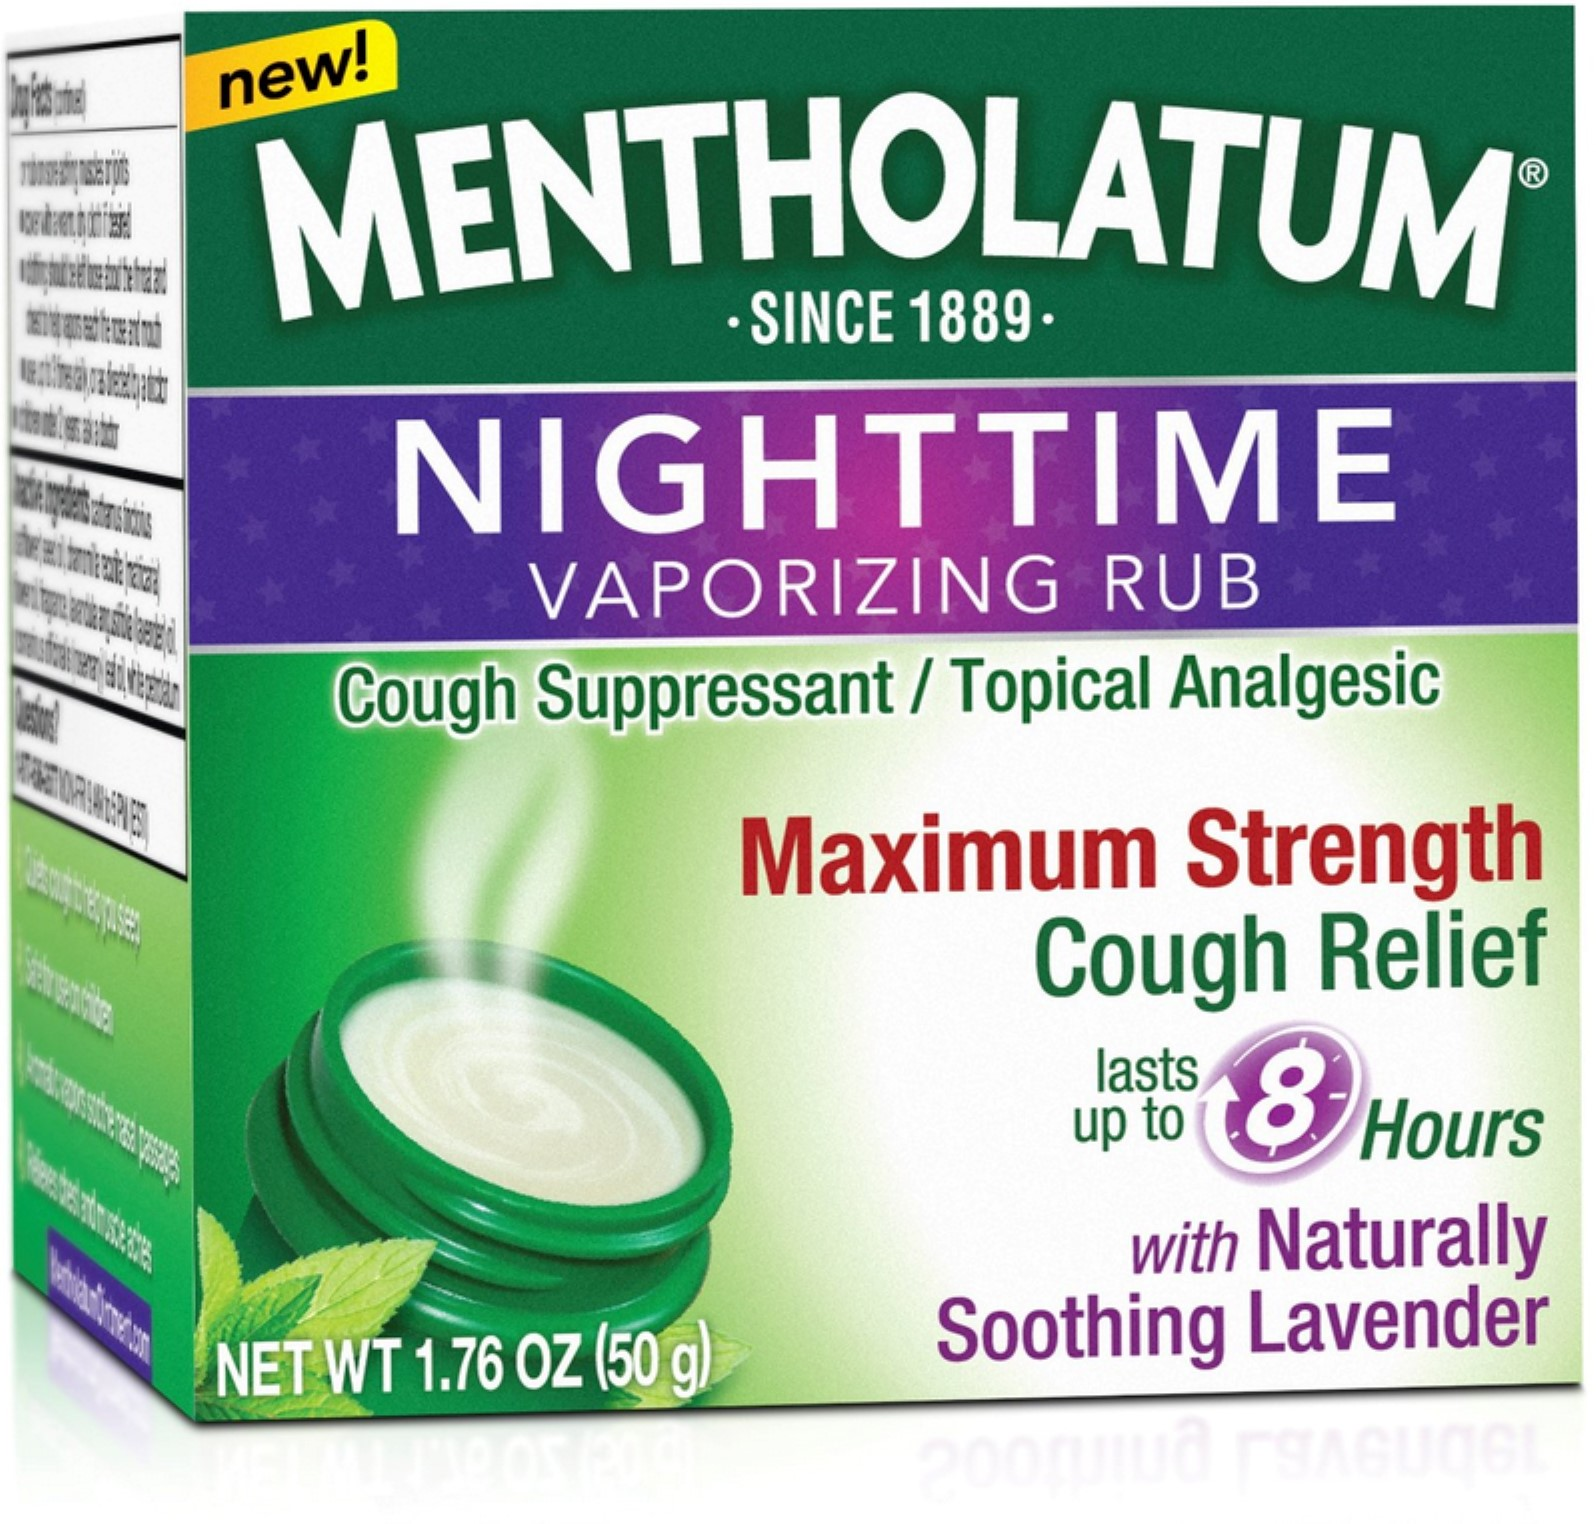 Mentholatum Nighttime Maximum Strength Vaporizing Rub - 1.76 Oz